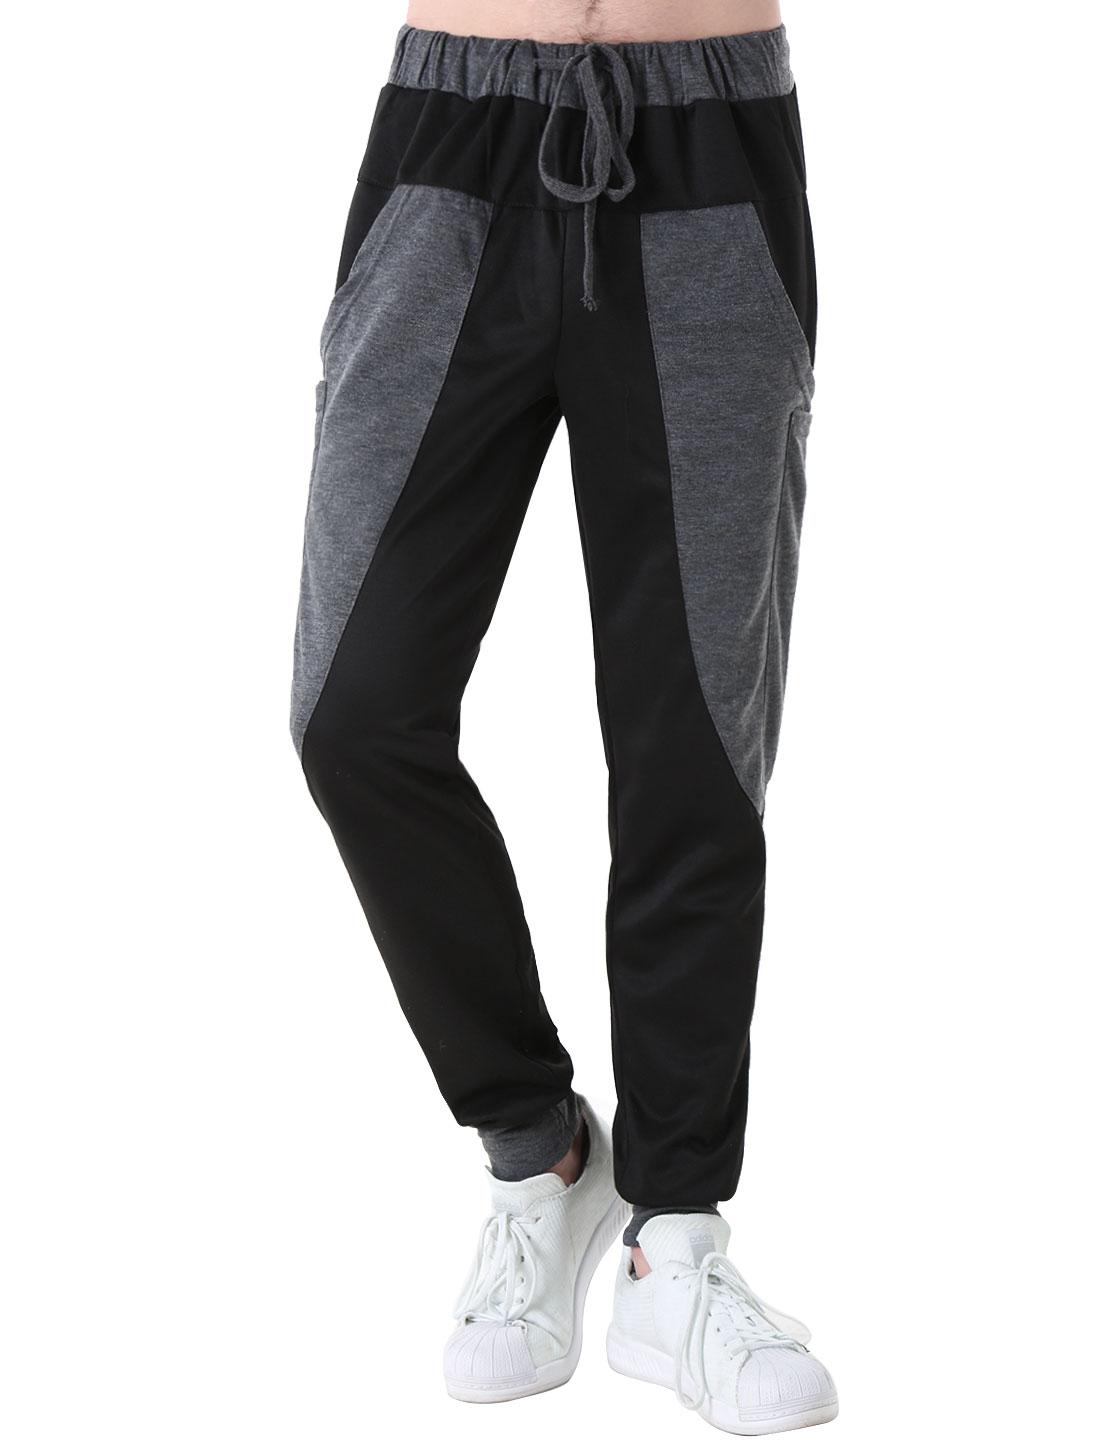 Man Color Block Fashion NEW Elastic Waist Sports Pants Black W34